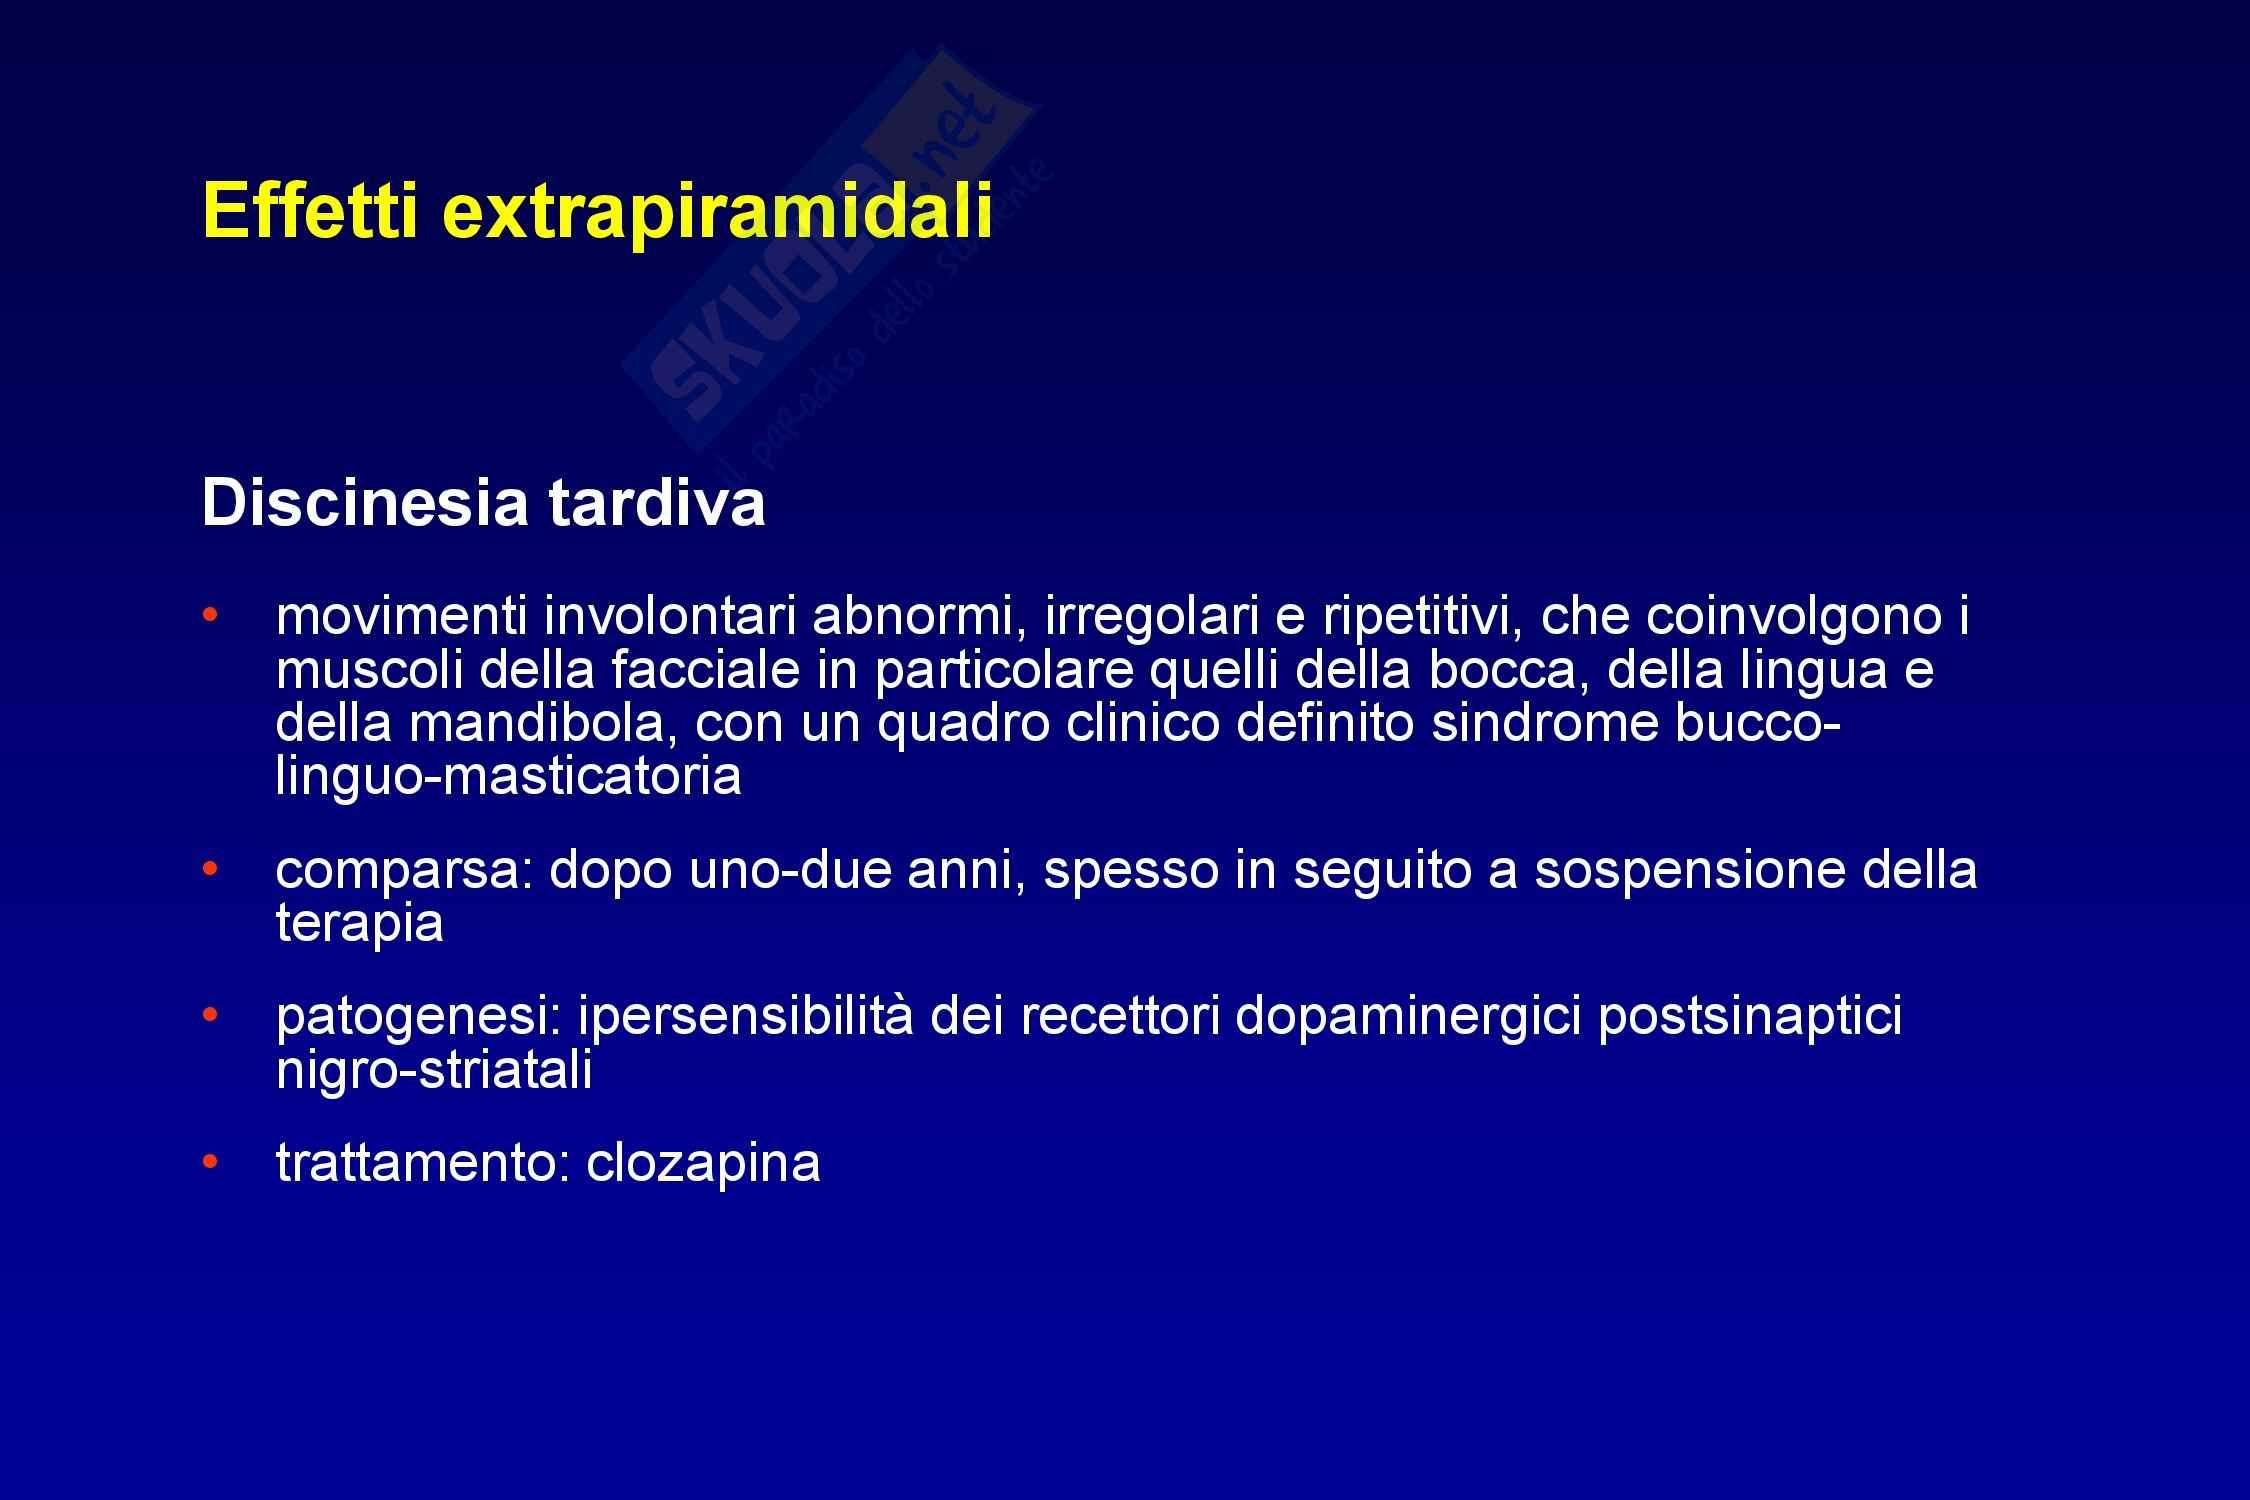 Antipsicotici Pag. 26